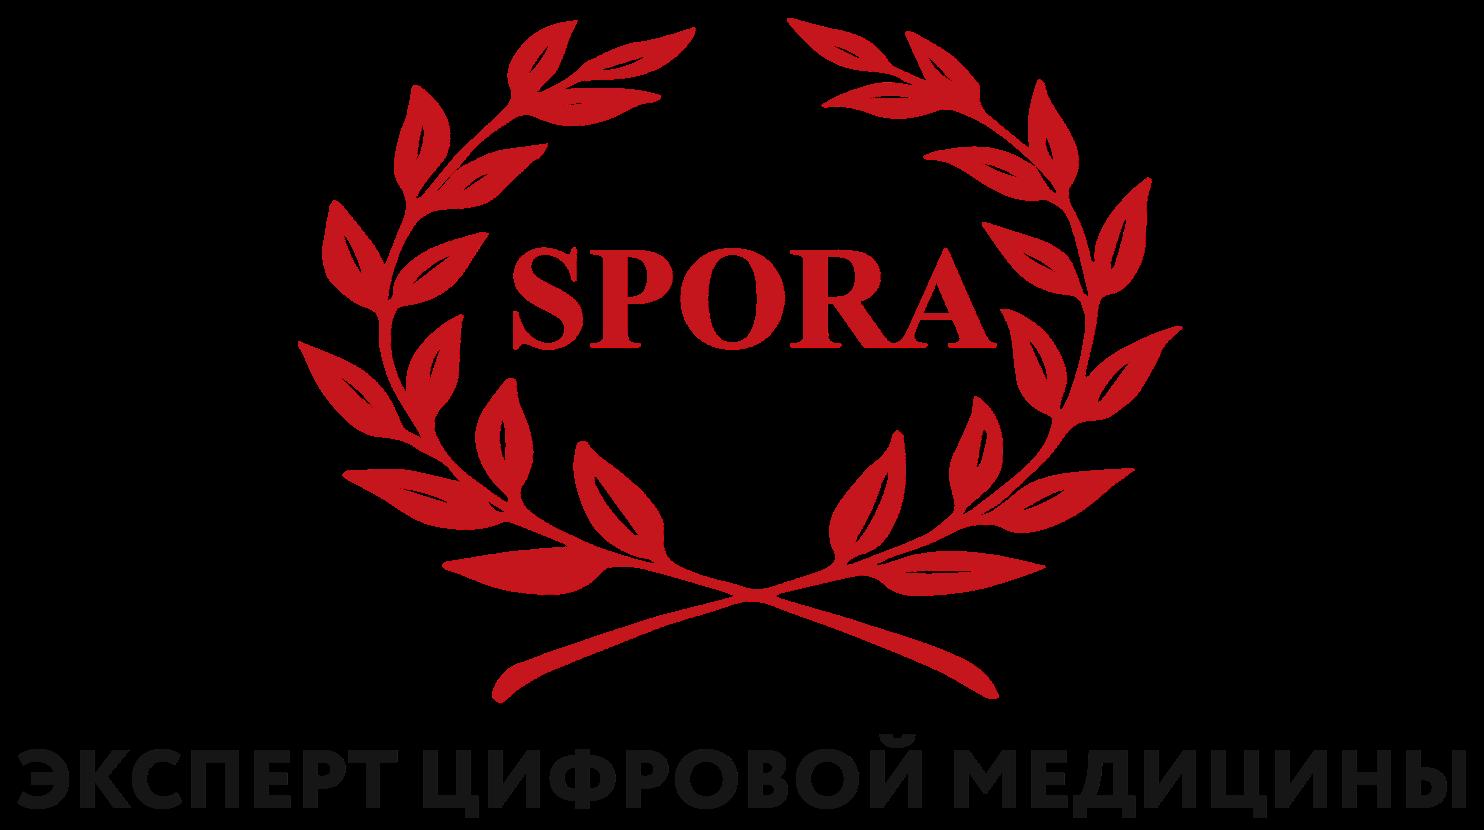 Spora